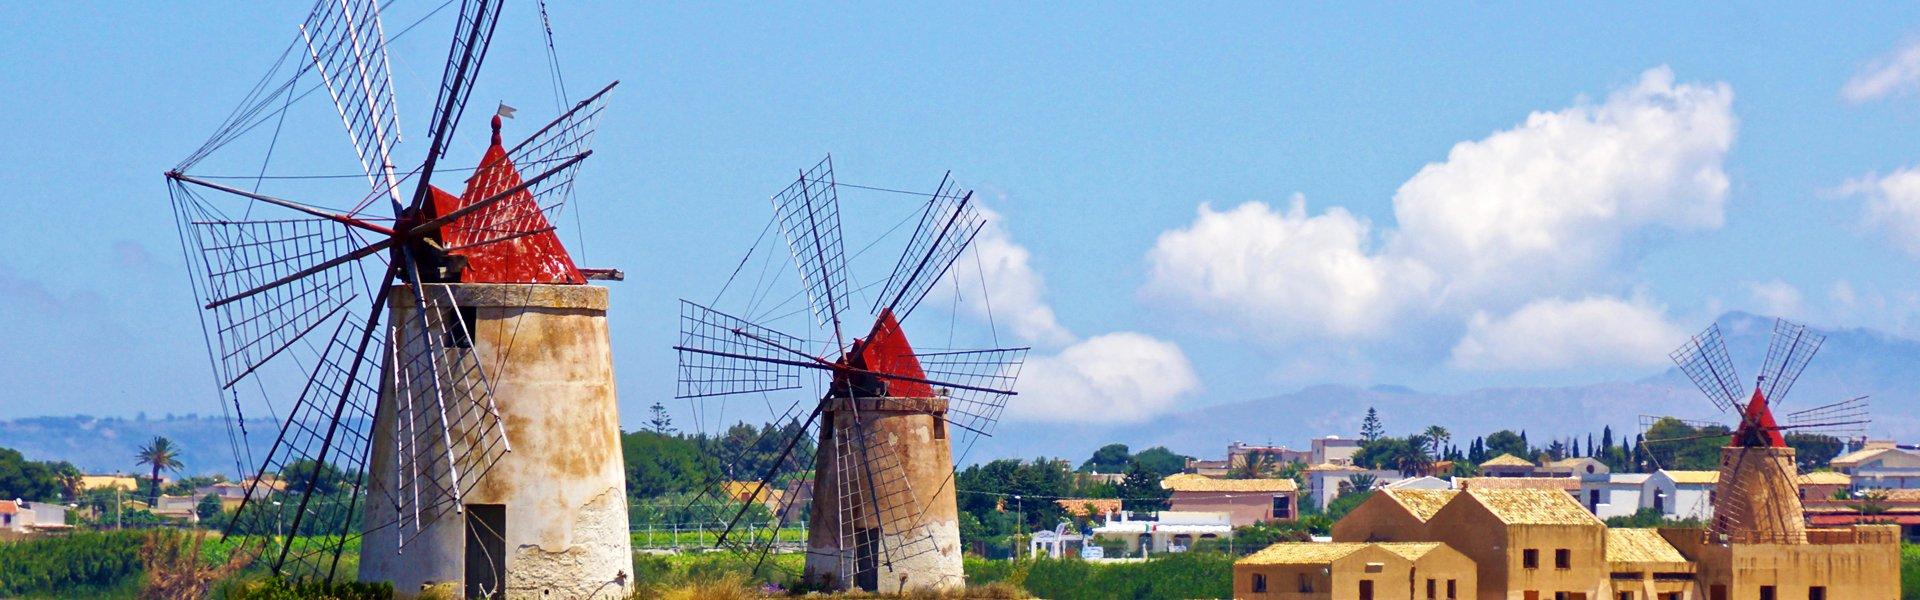 Trapani op Sicilië, Italië